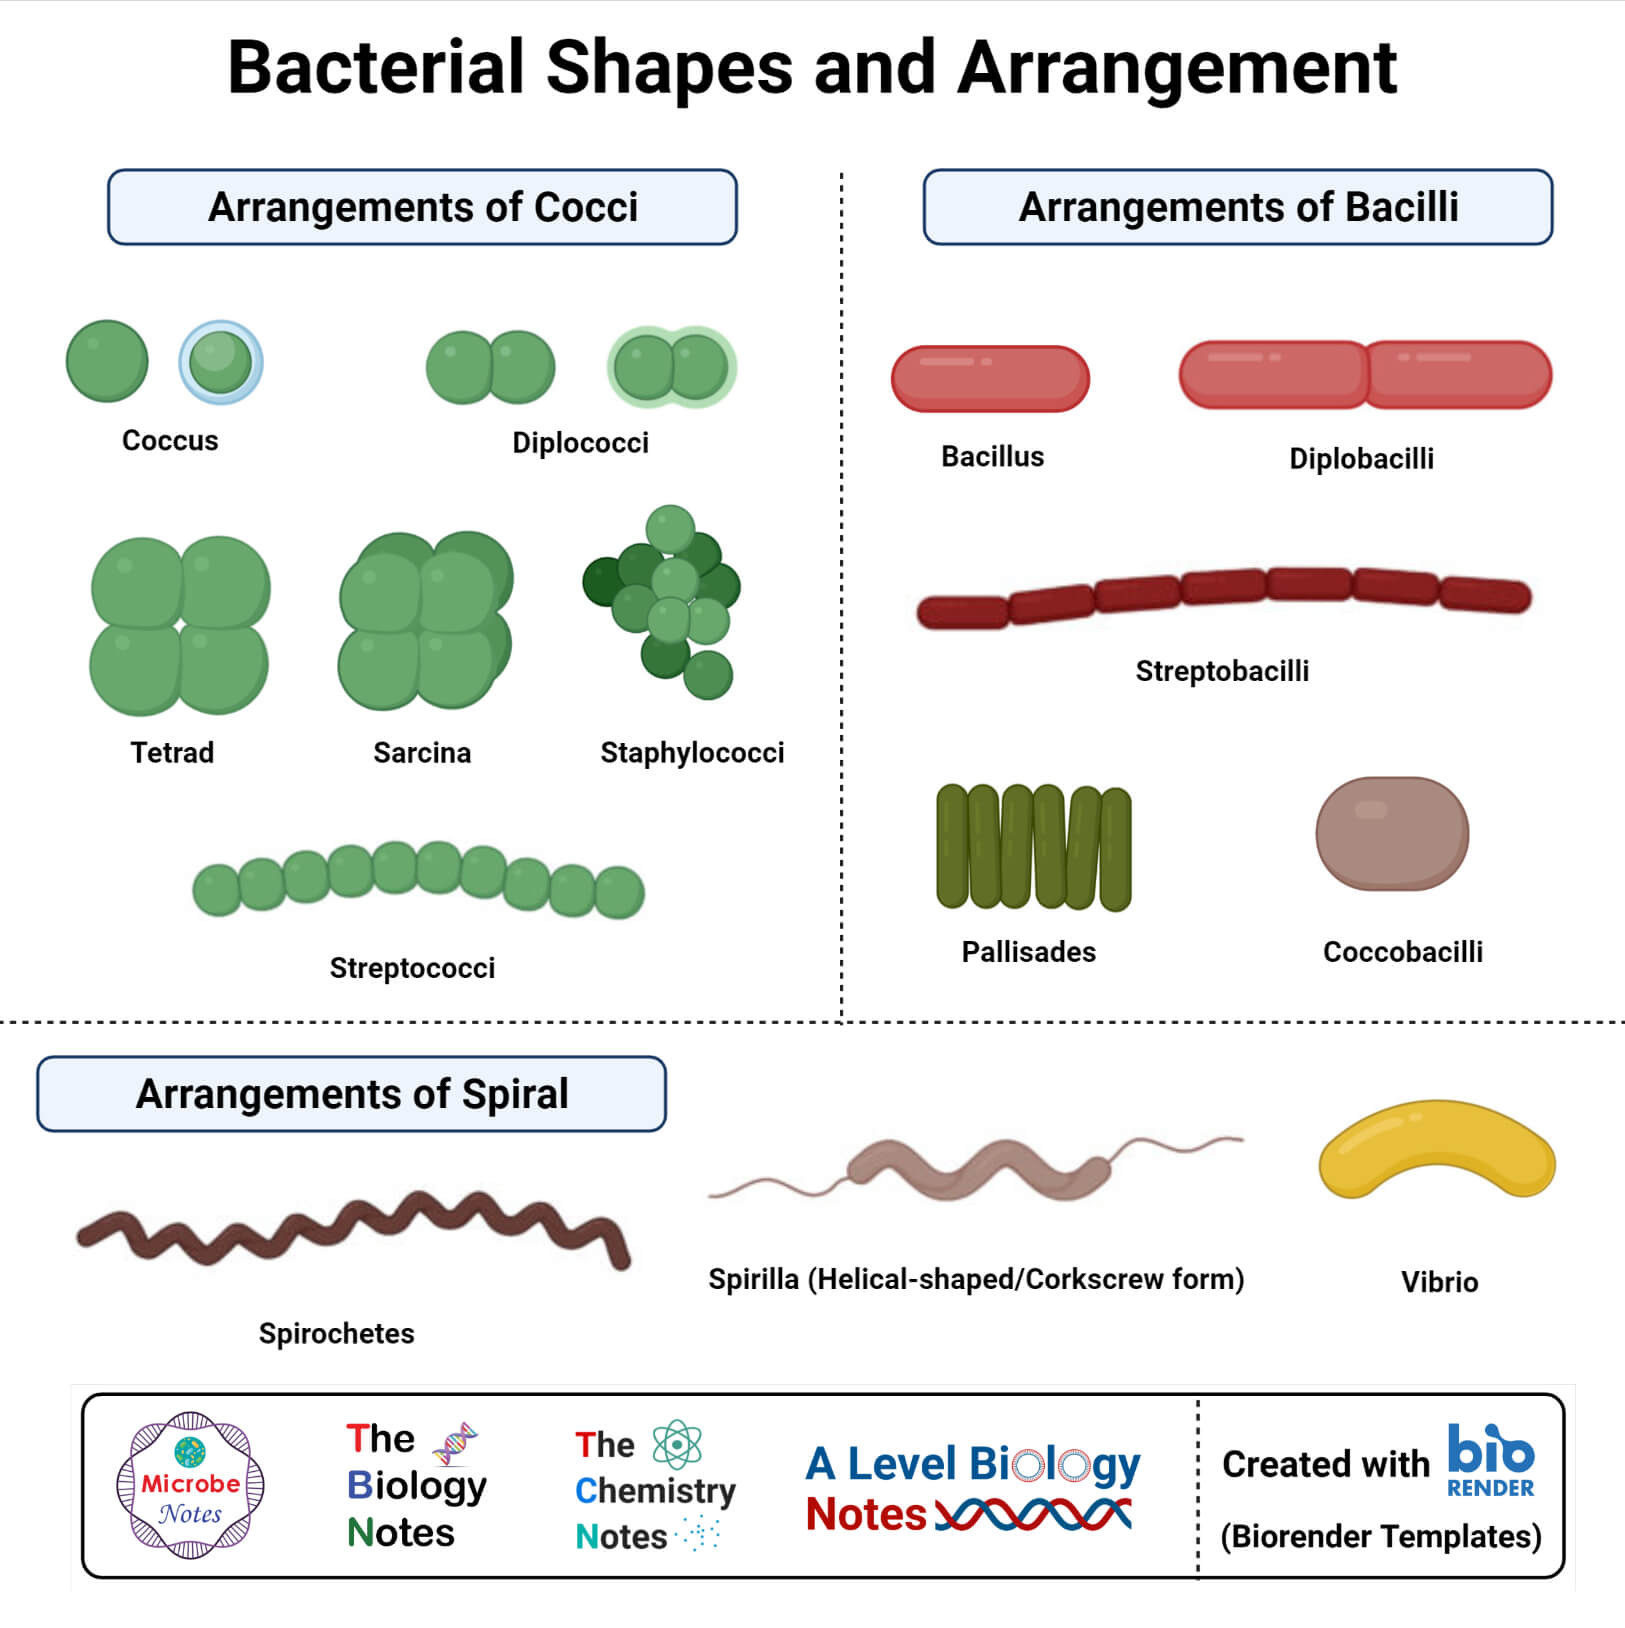 Morphology of Bacteria- Sizes, Shapes, Arrangements, Examples